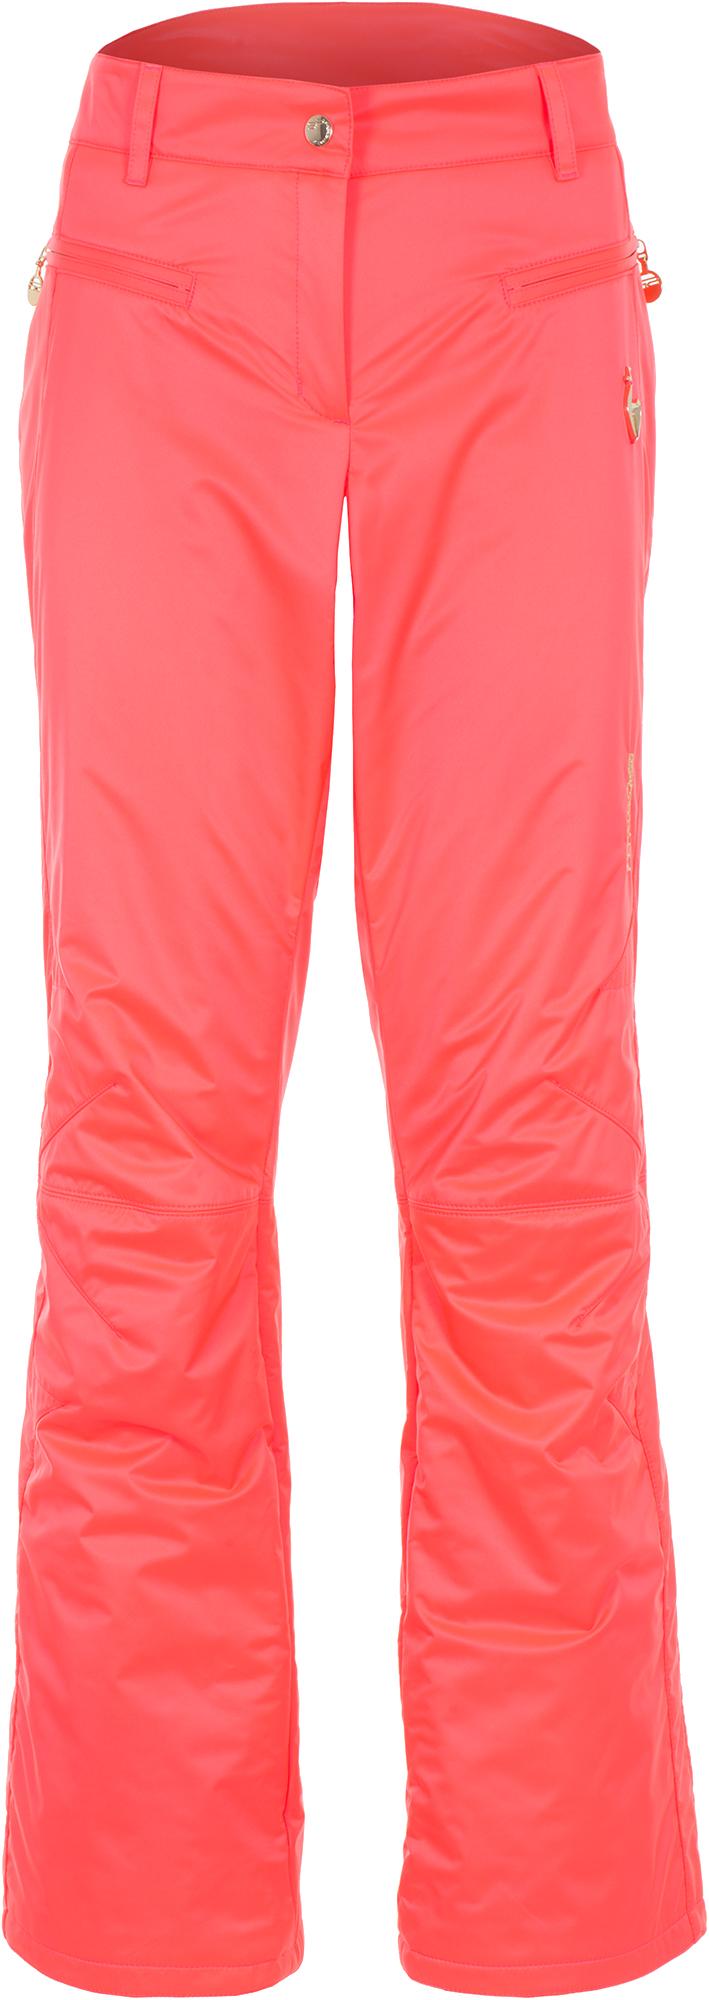 Sportalm Брюки утепленные женские Sportalm Bird RR, размер 46 брюки утепленные женские icepeak цвет темно синий 854020542iv 390 размер 34 40